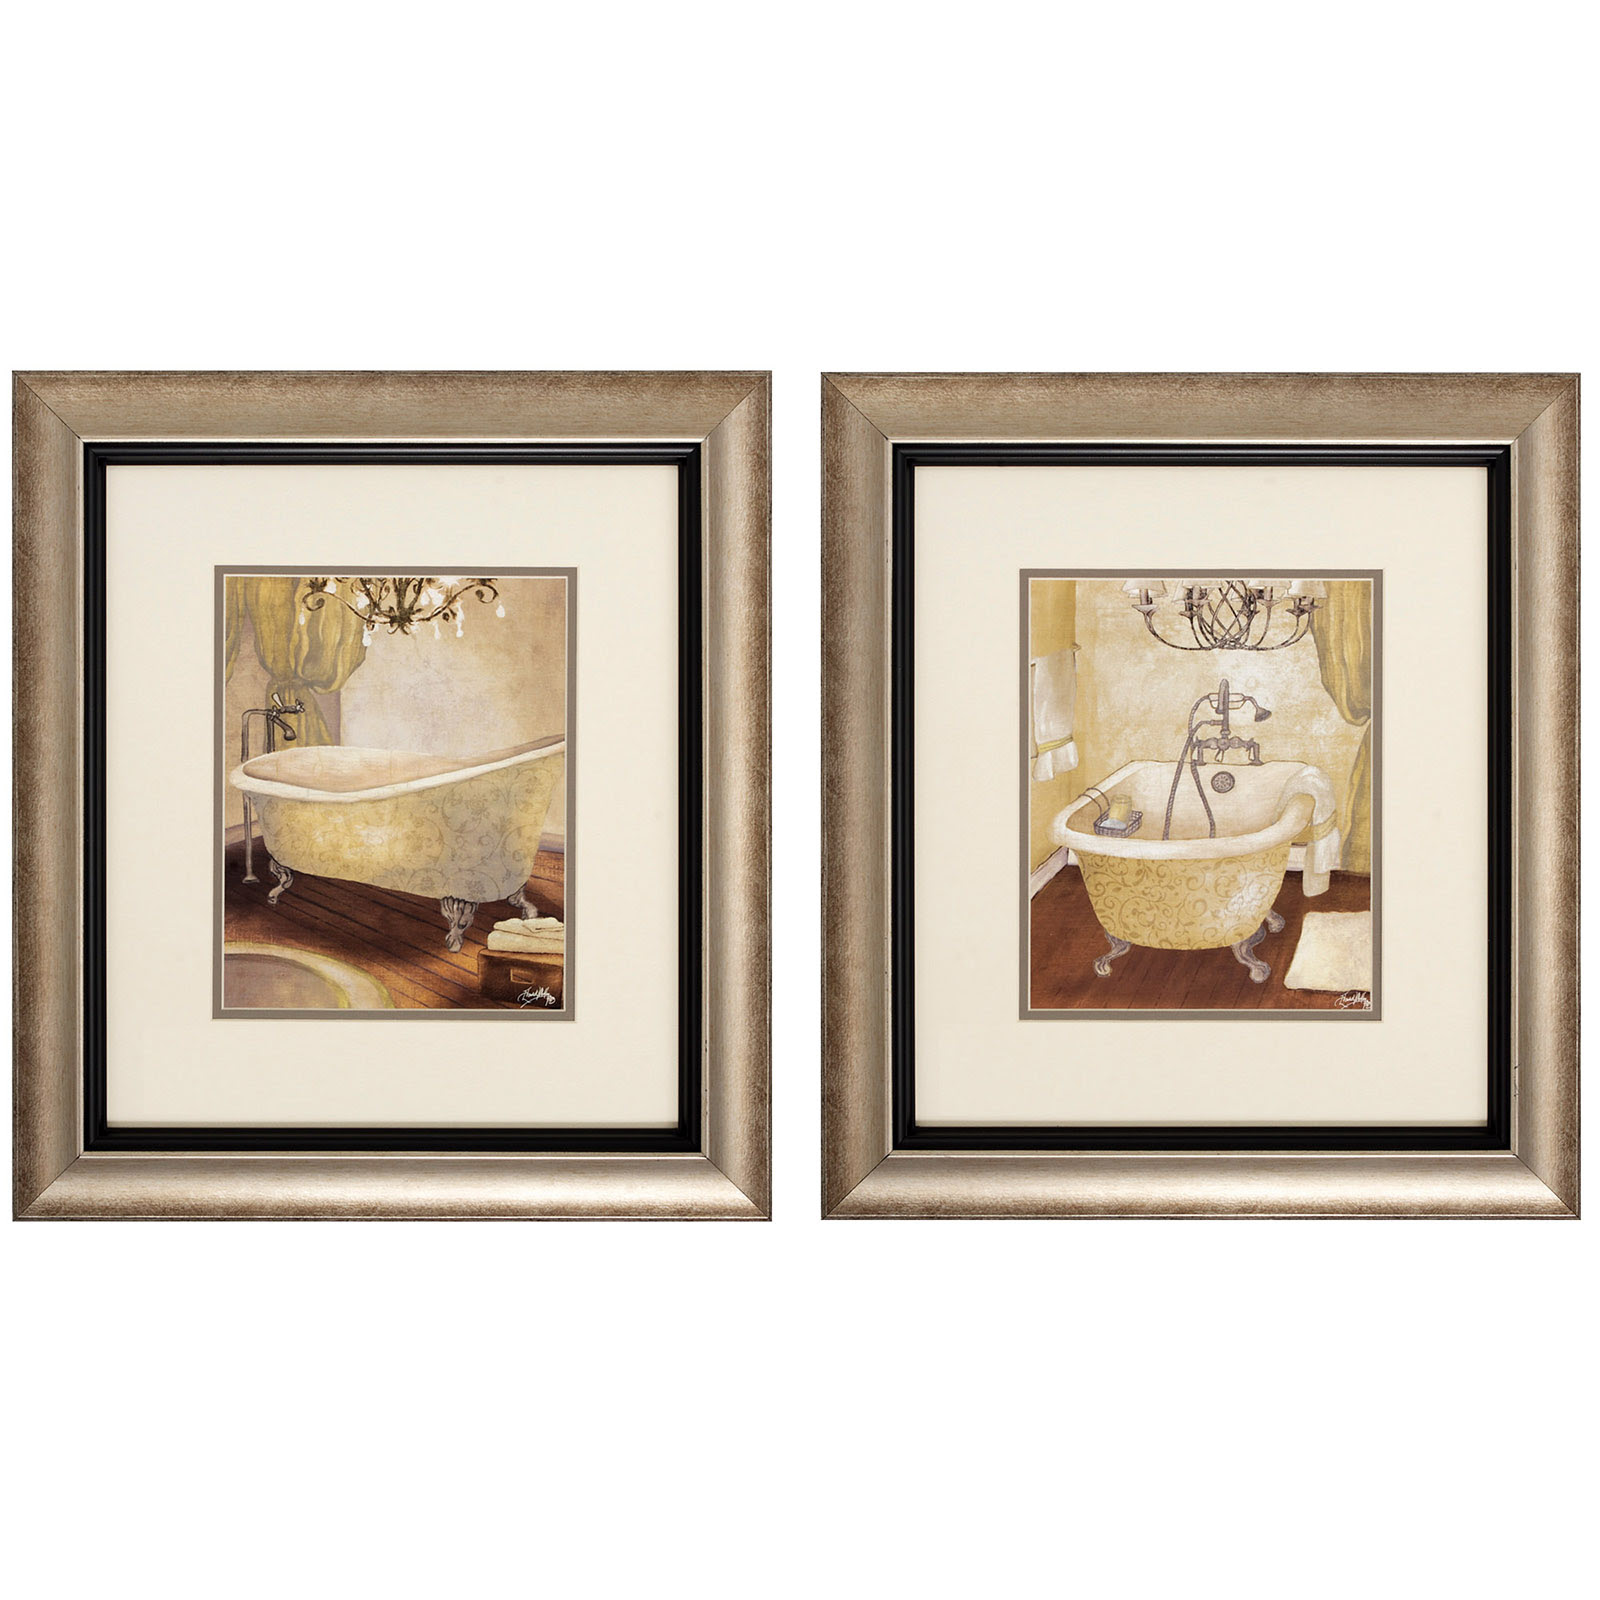 Elegant Bathroom Framed Wall Art - Set of 2 - 17W x 19H in. ea. - Wall Art at Hayneedle